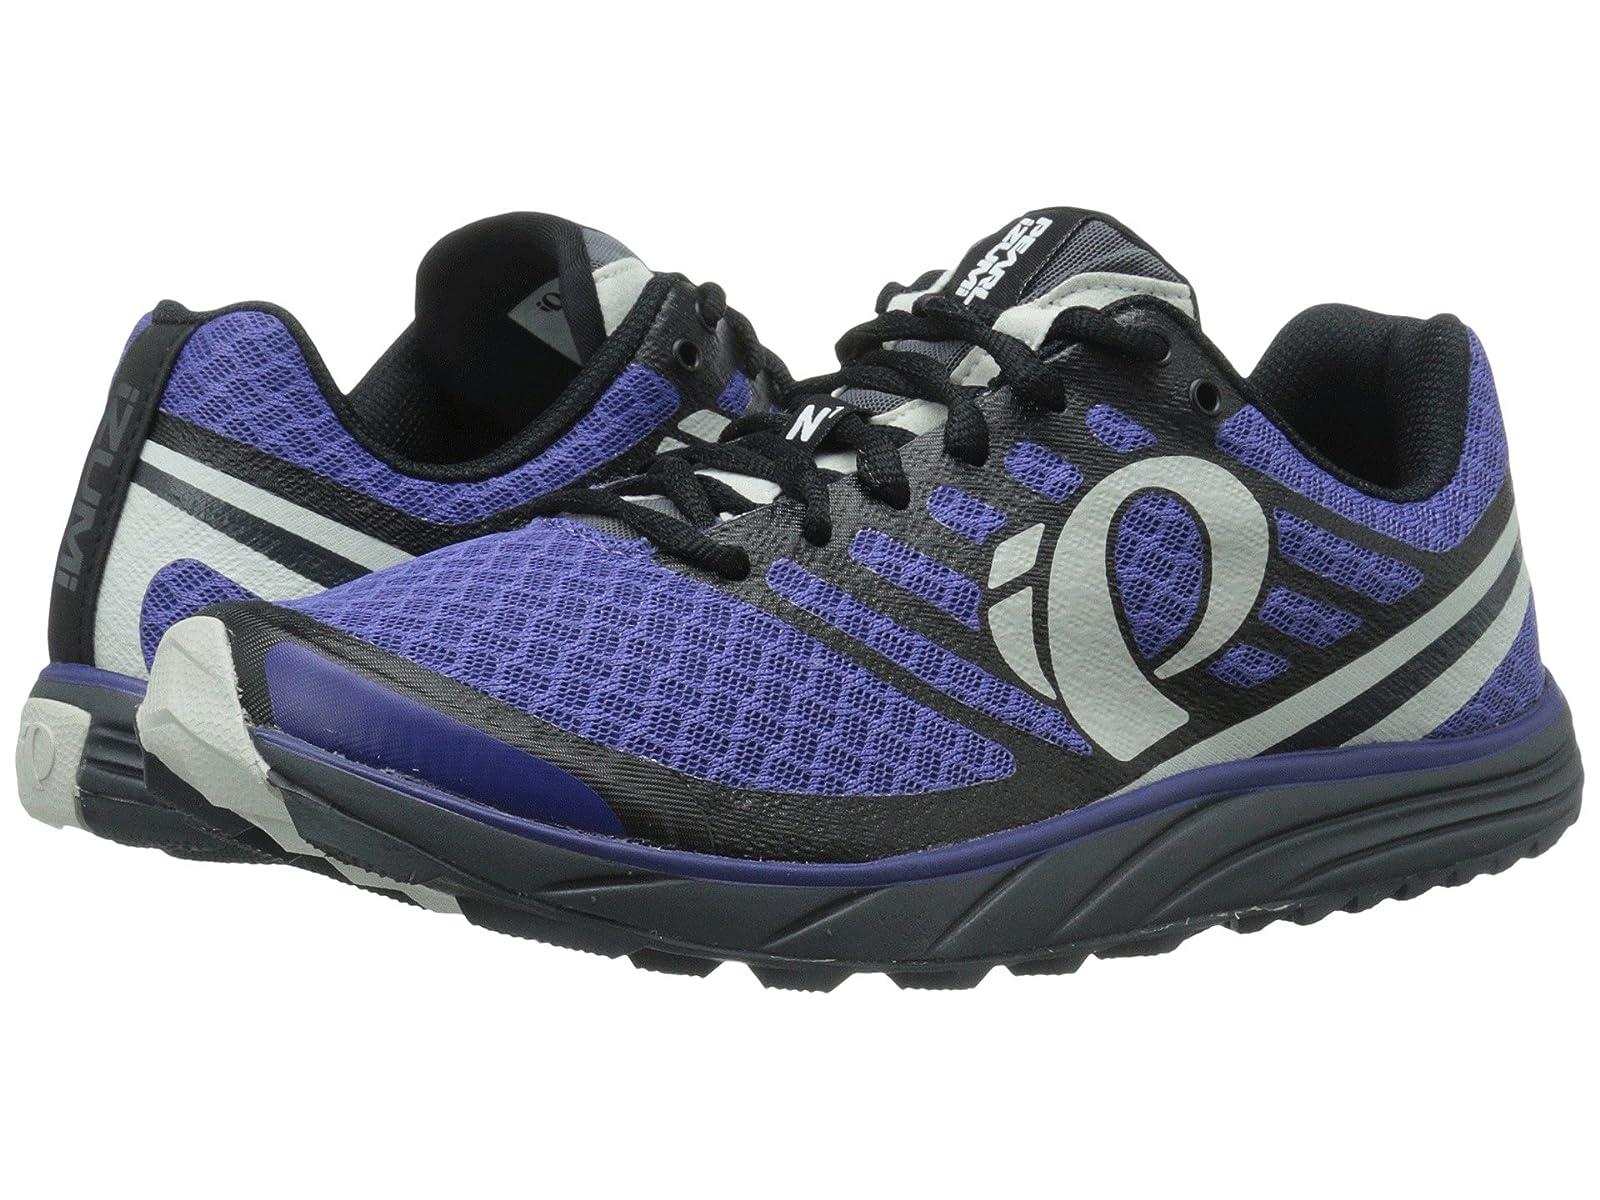 Pearl Izumi EM Trail N 1 v2Cheap and distinctive eye-catching shoes